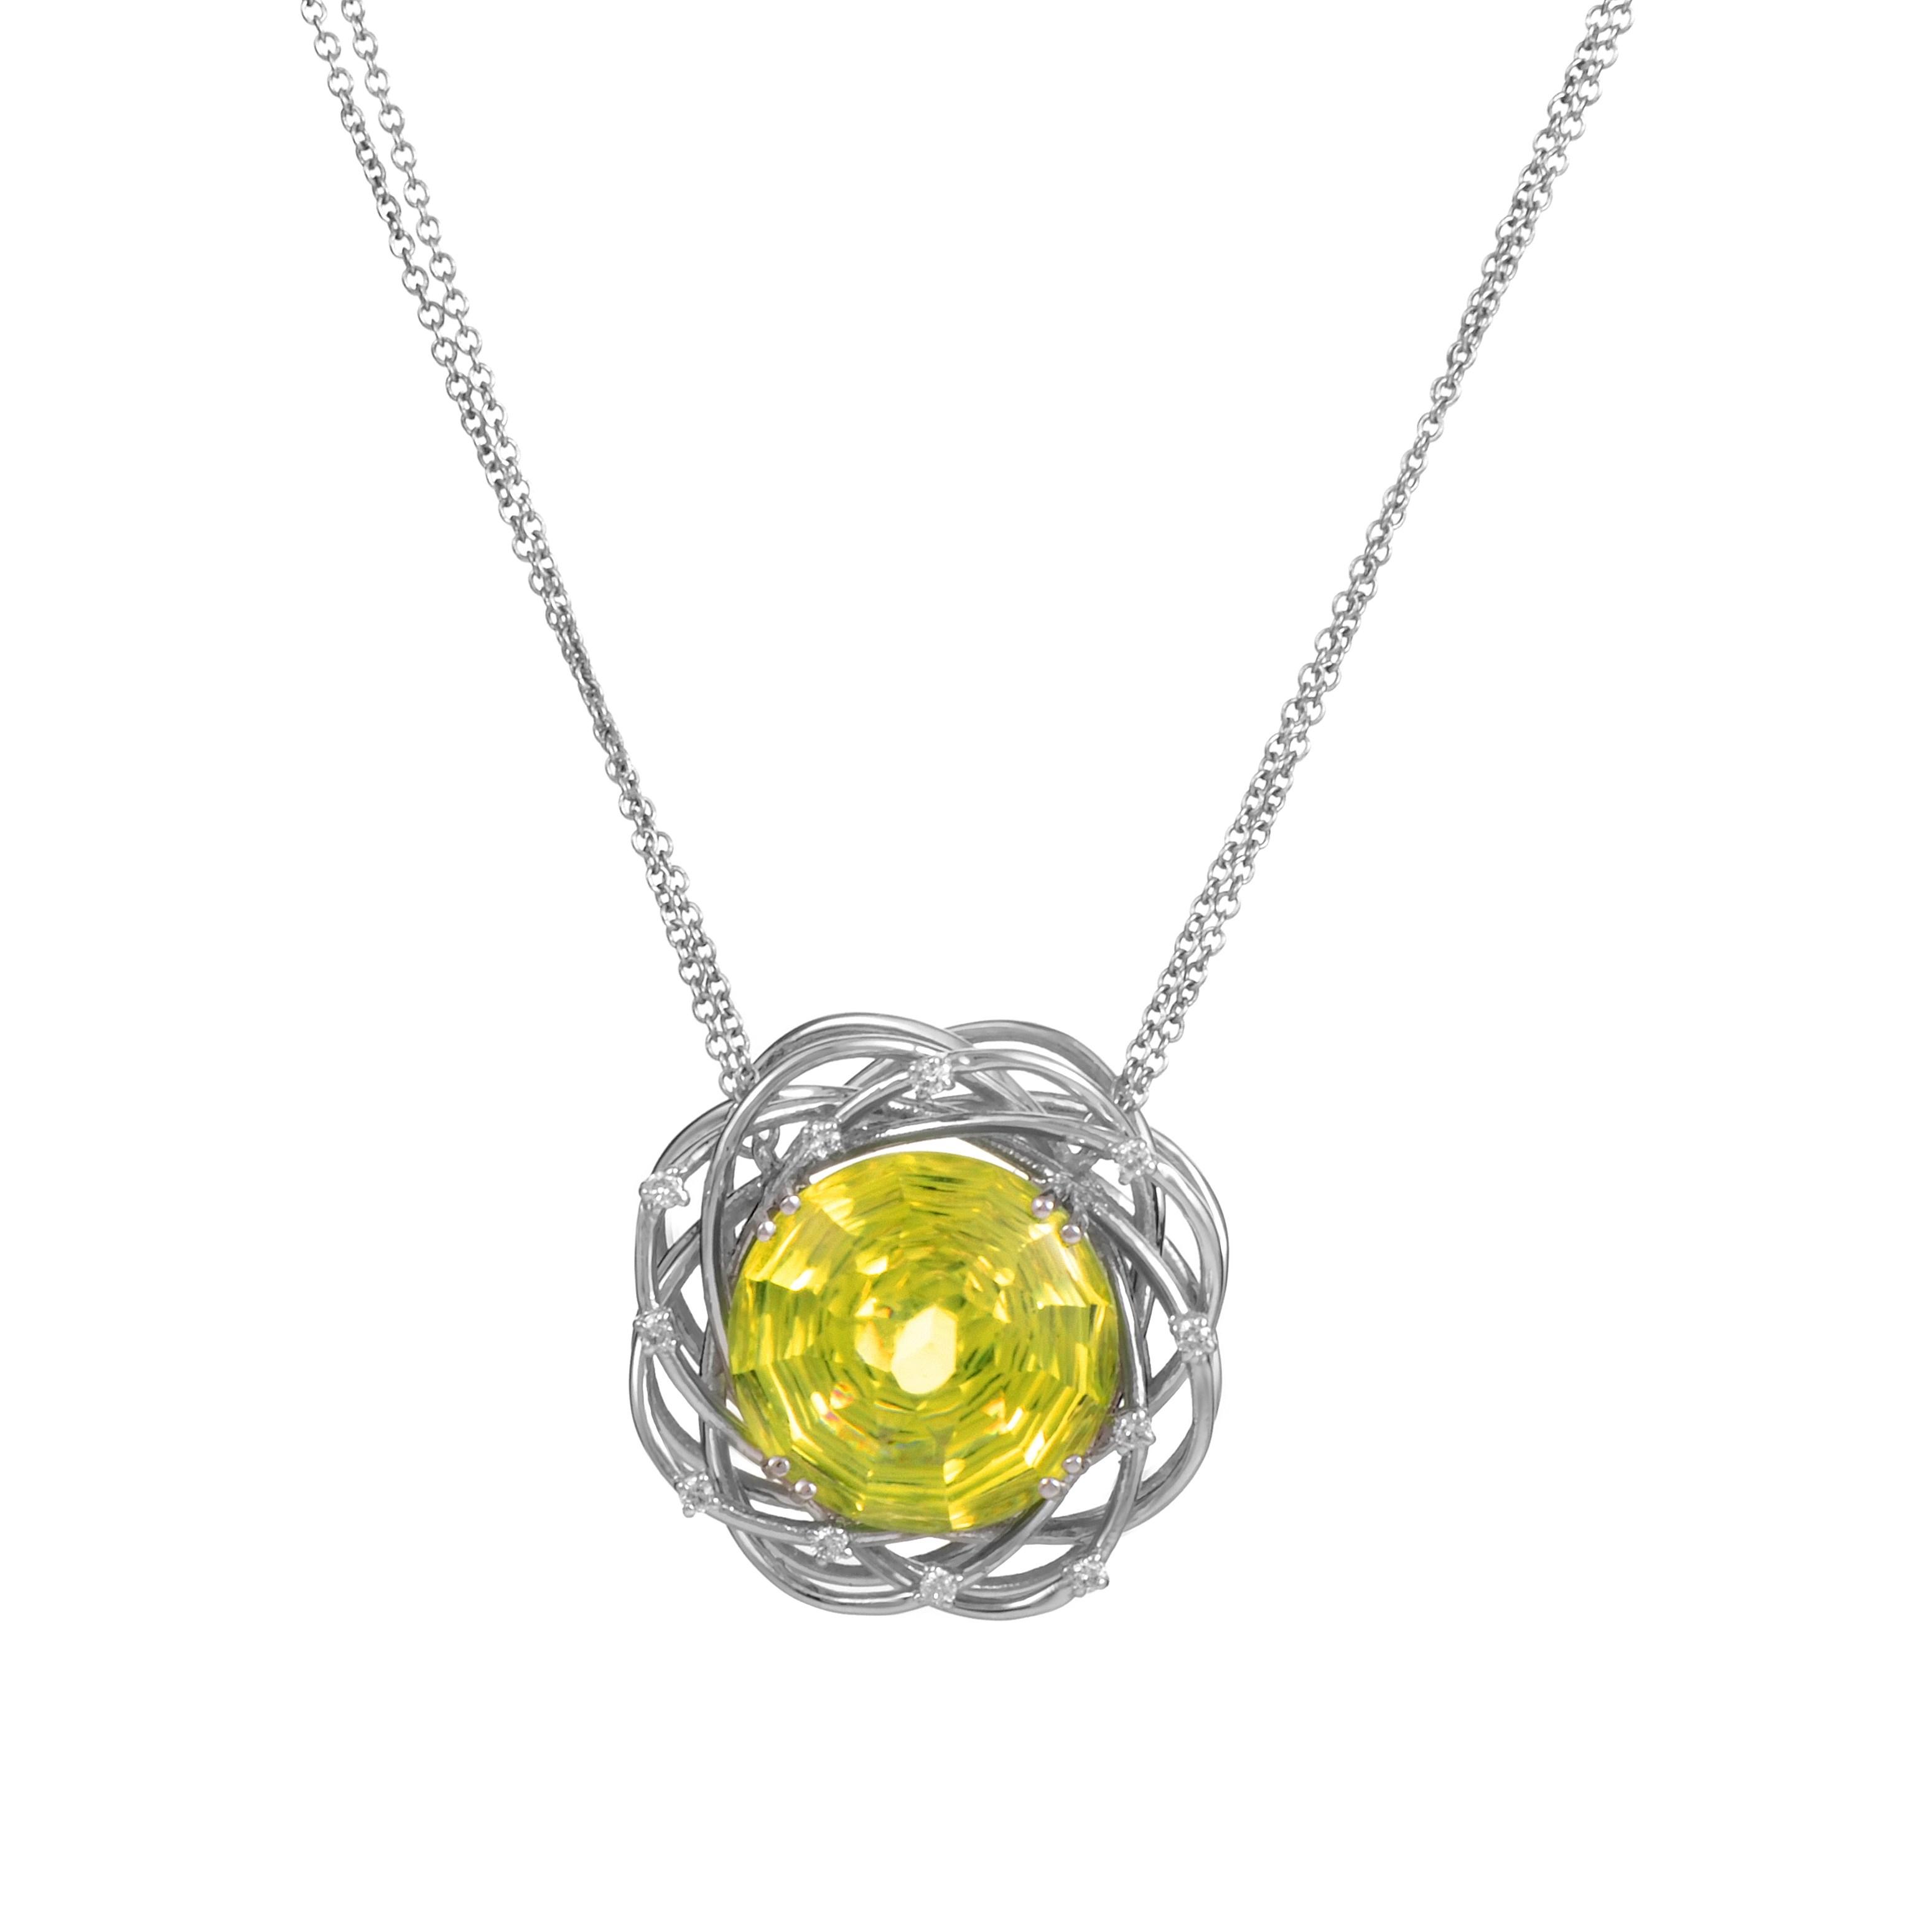 18K White Gold Lemon Quartz & Diamond Pendant Necklace